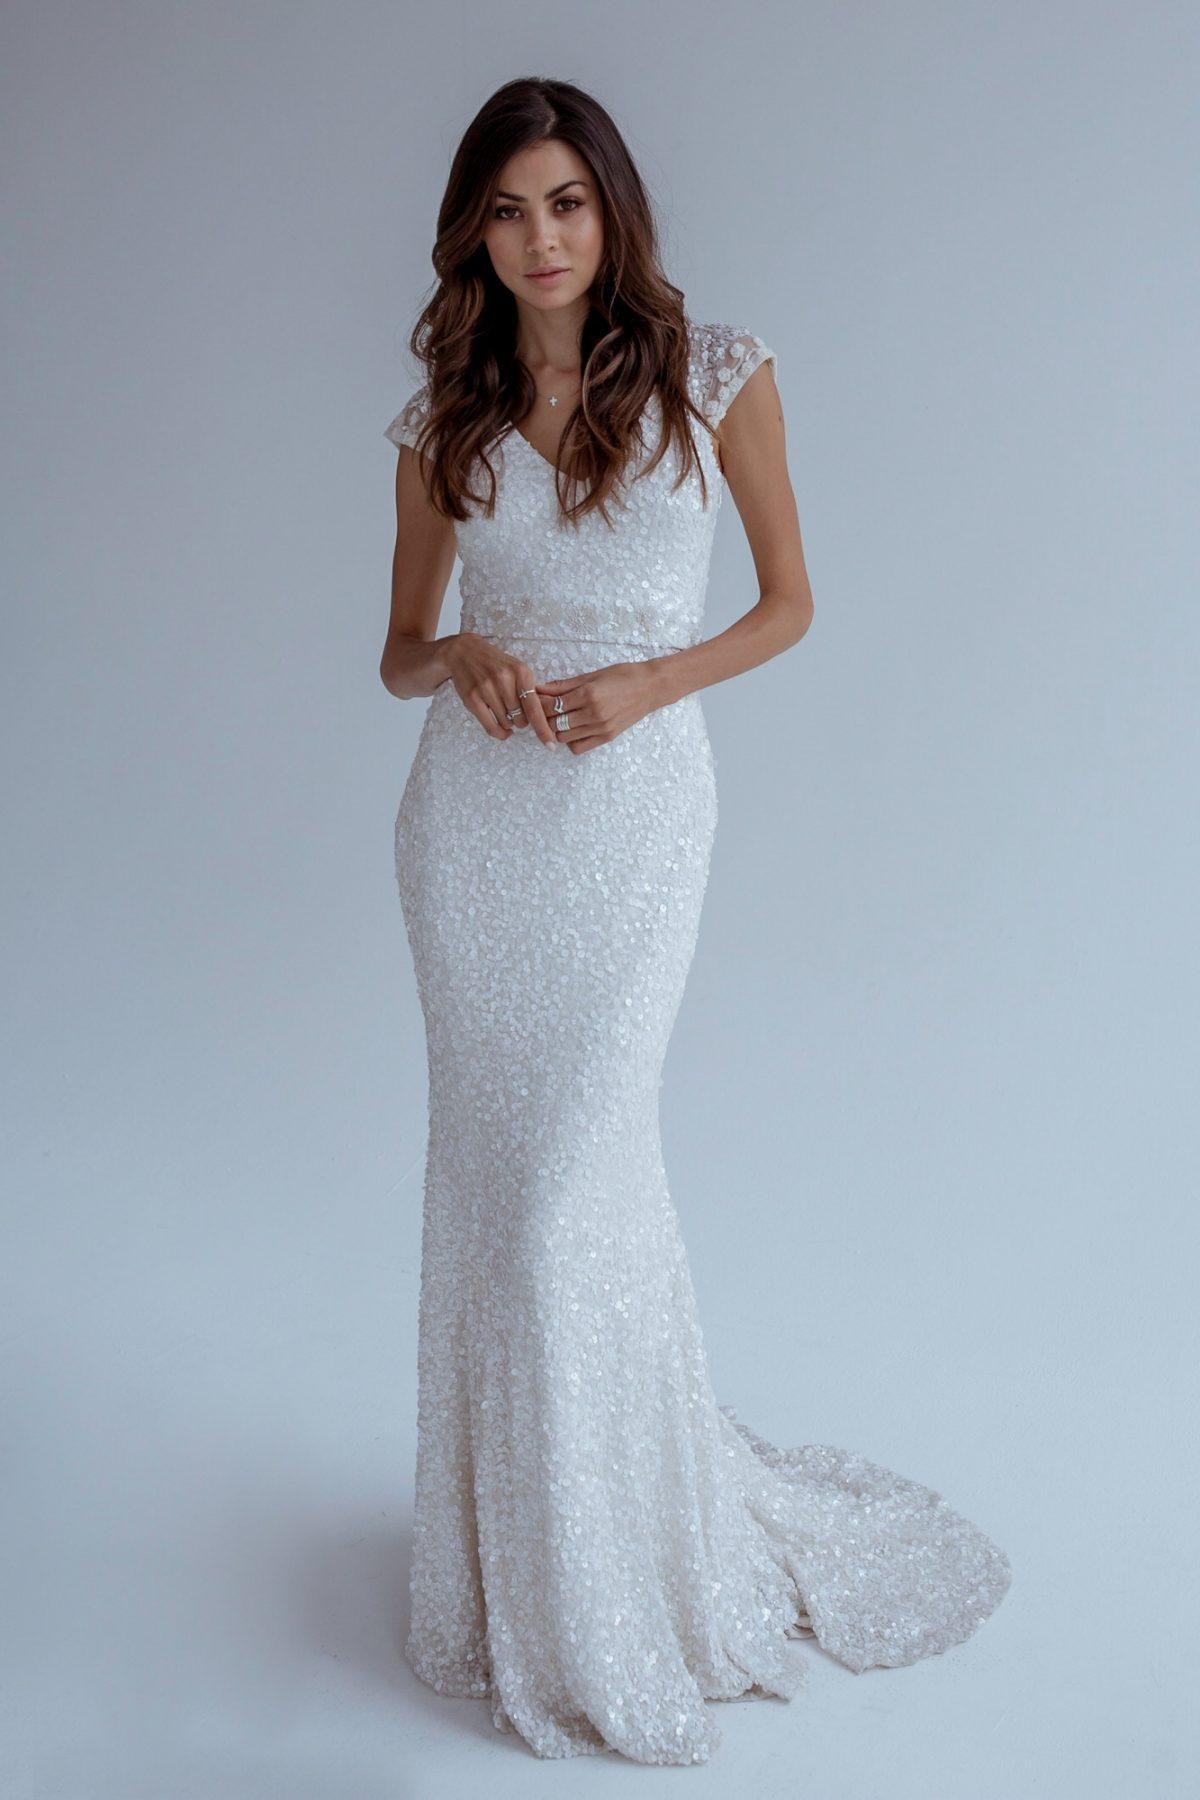 Trendy Sheath Wedding Dress   Kleinfeld Bridal